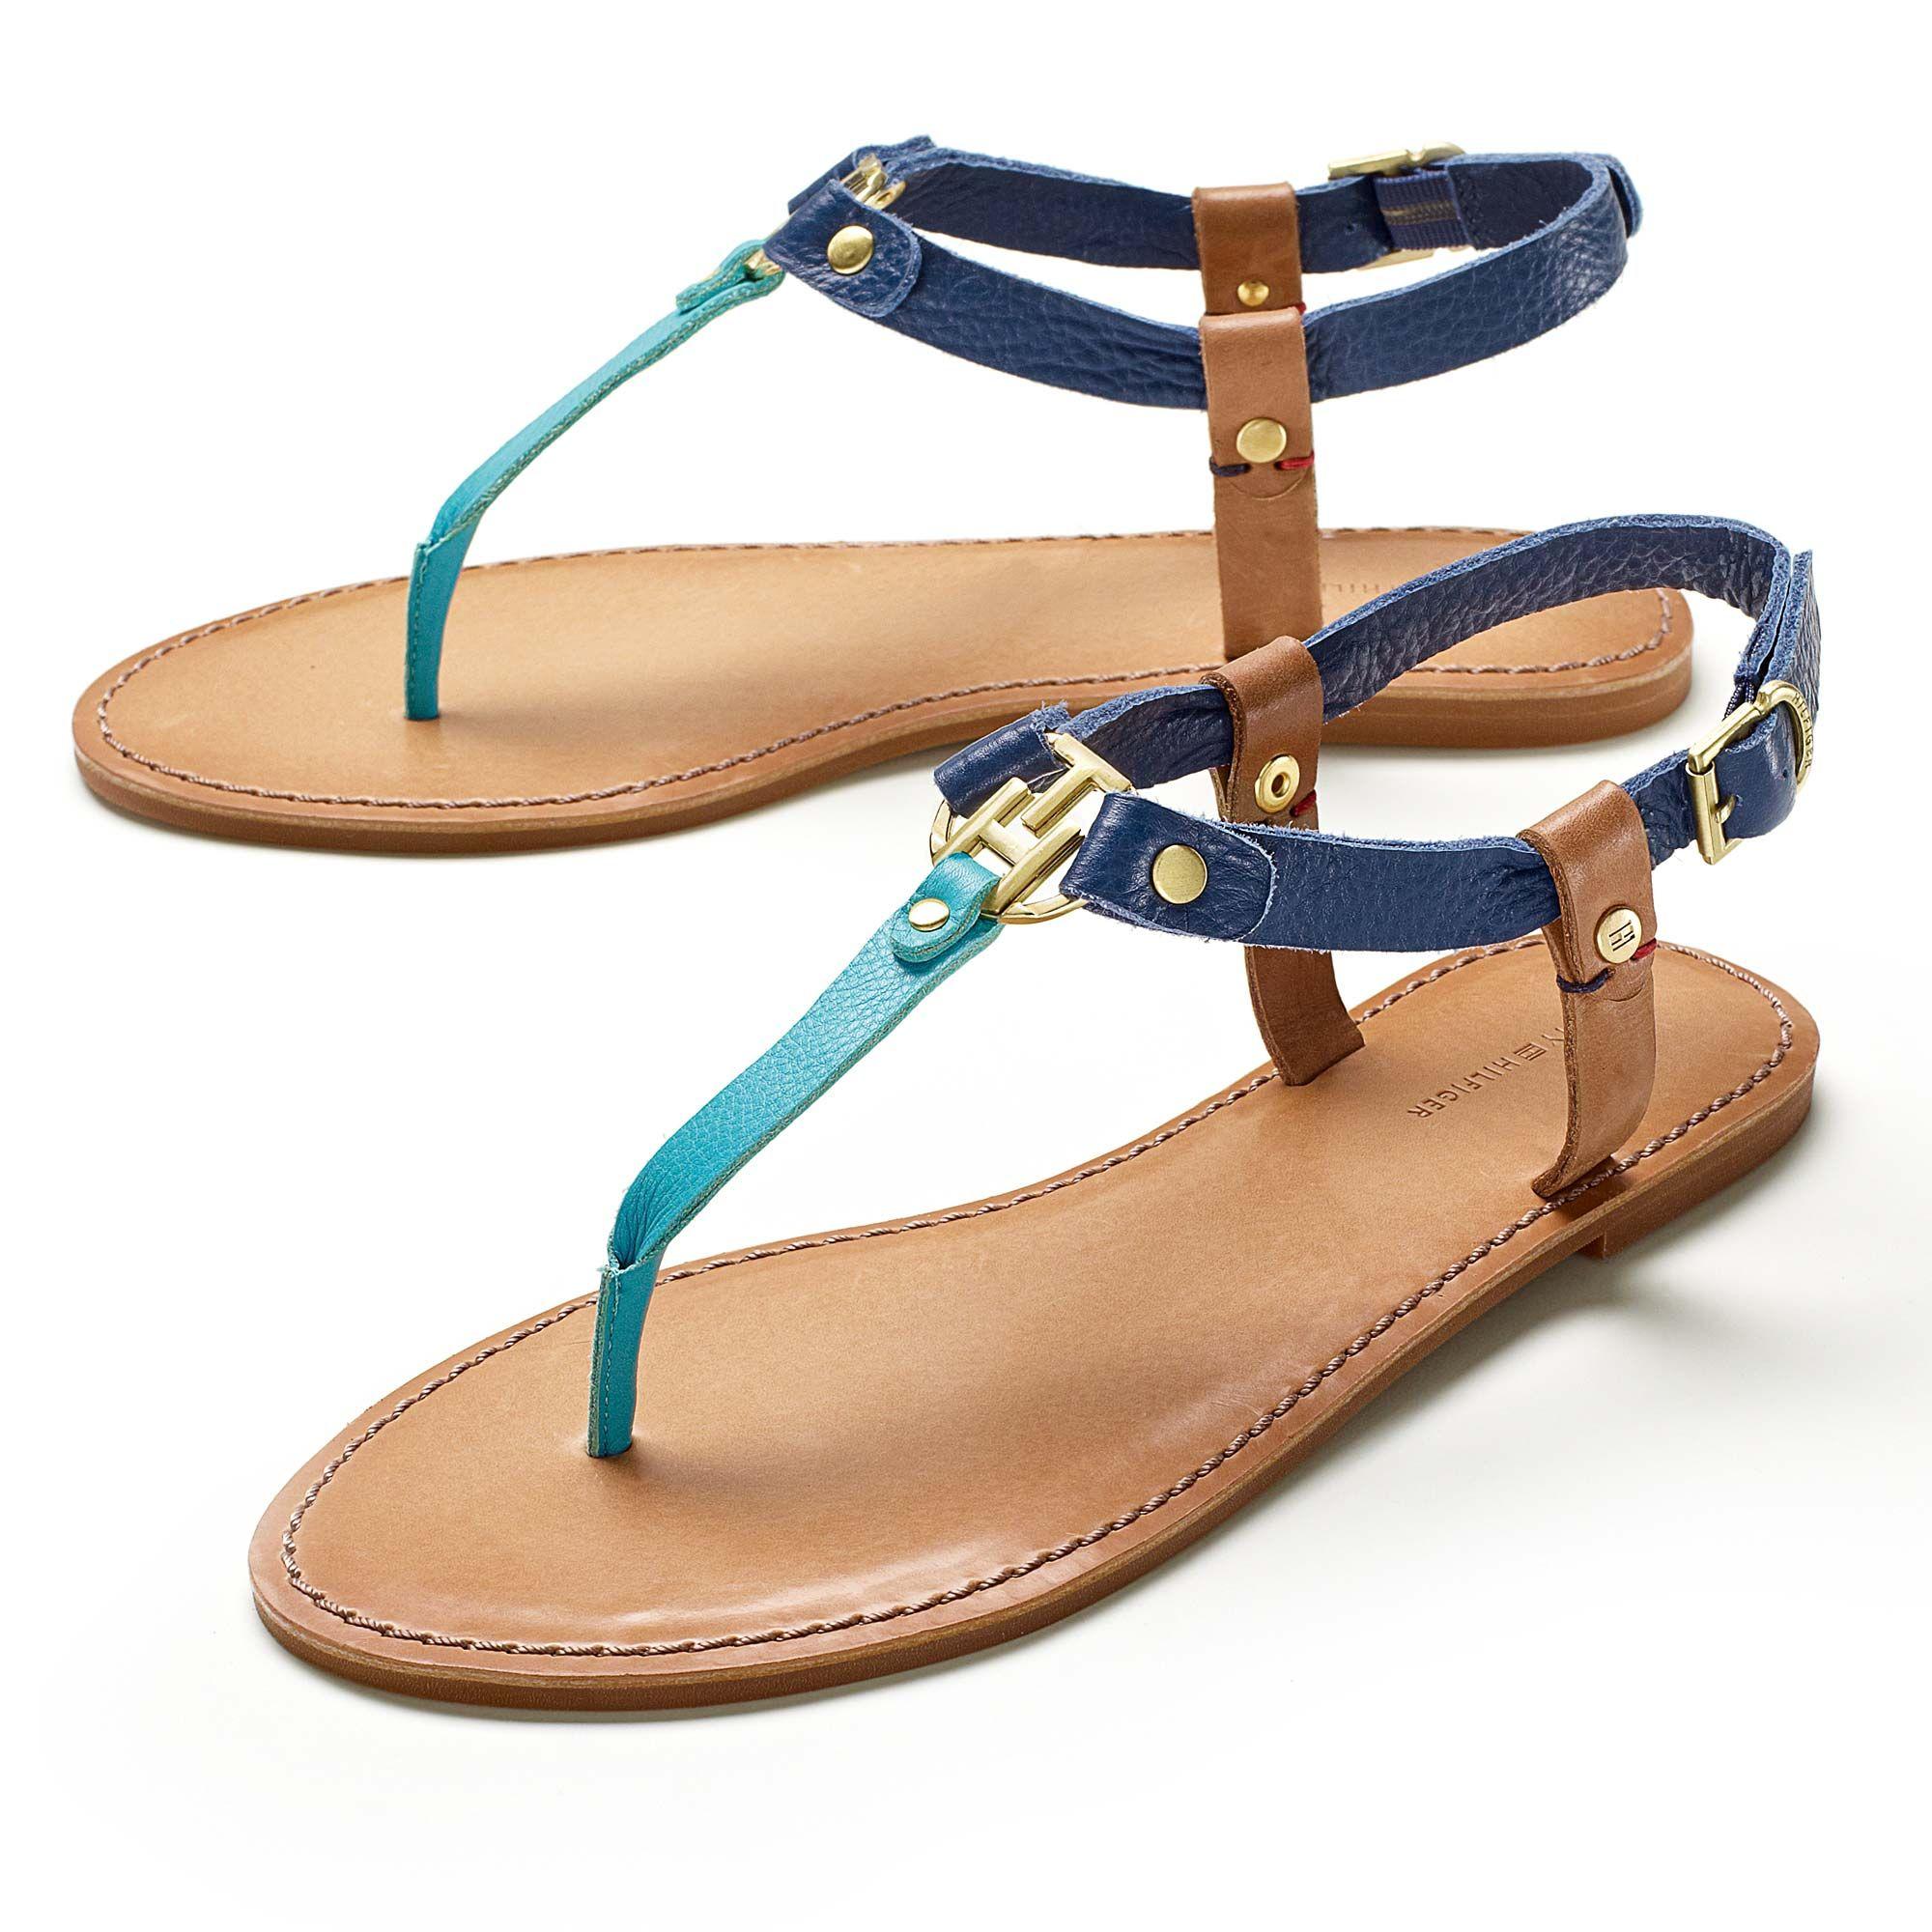 e536b8eaad657 Tommy Hilfiger sandals Nautical Shoes